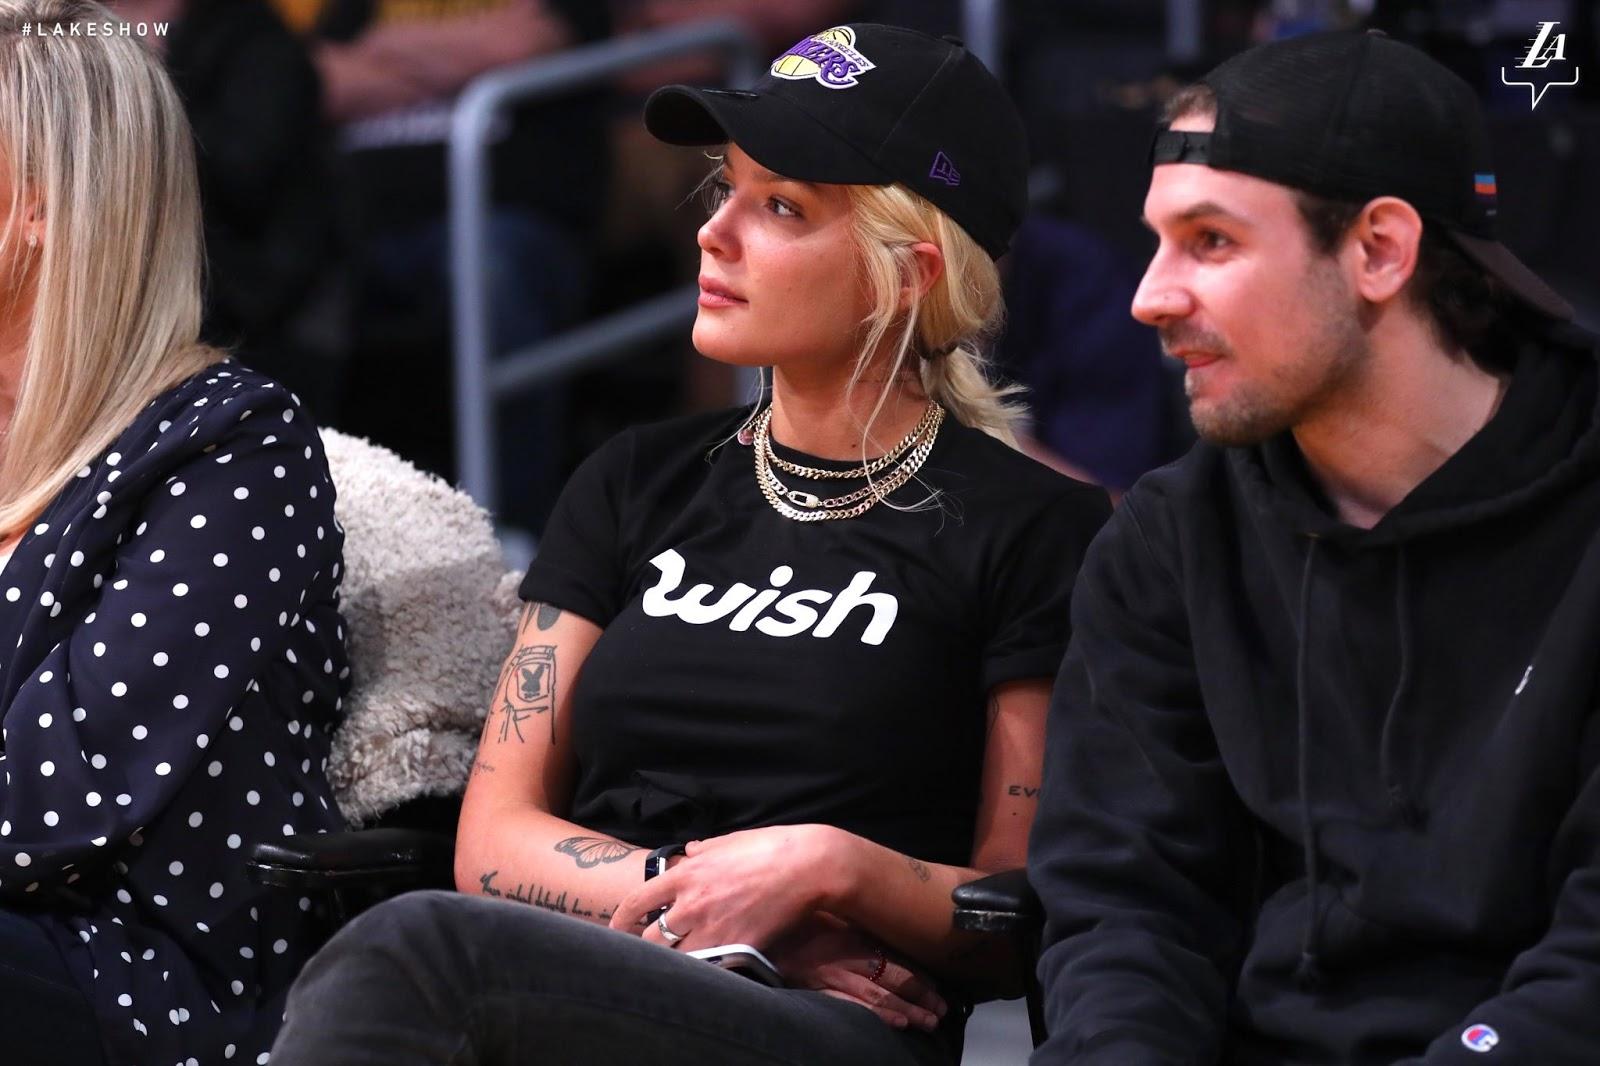 Wish Tee Shirt gear, Lakers game, Halsey